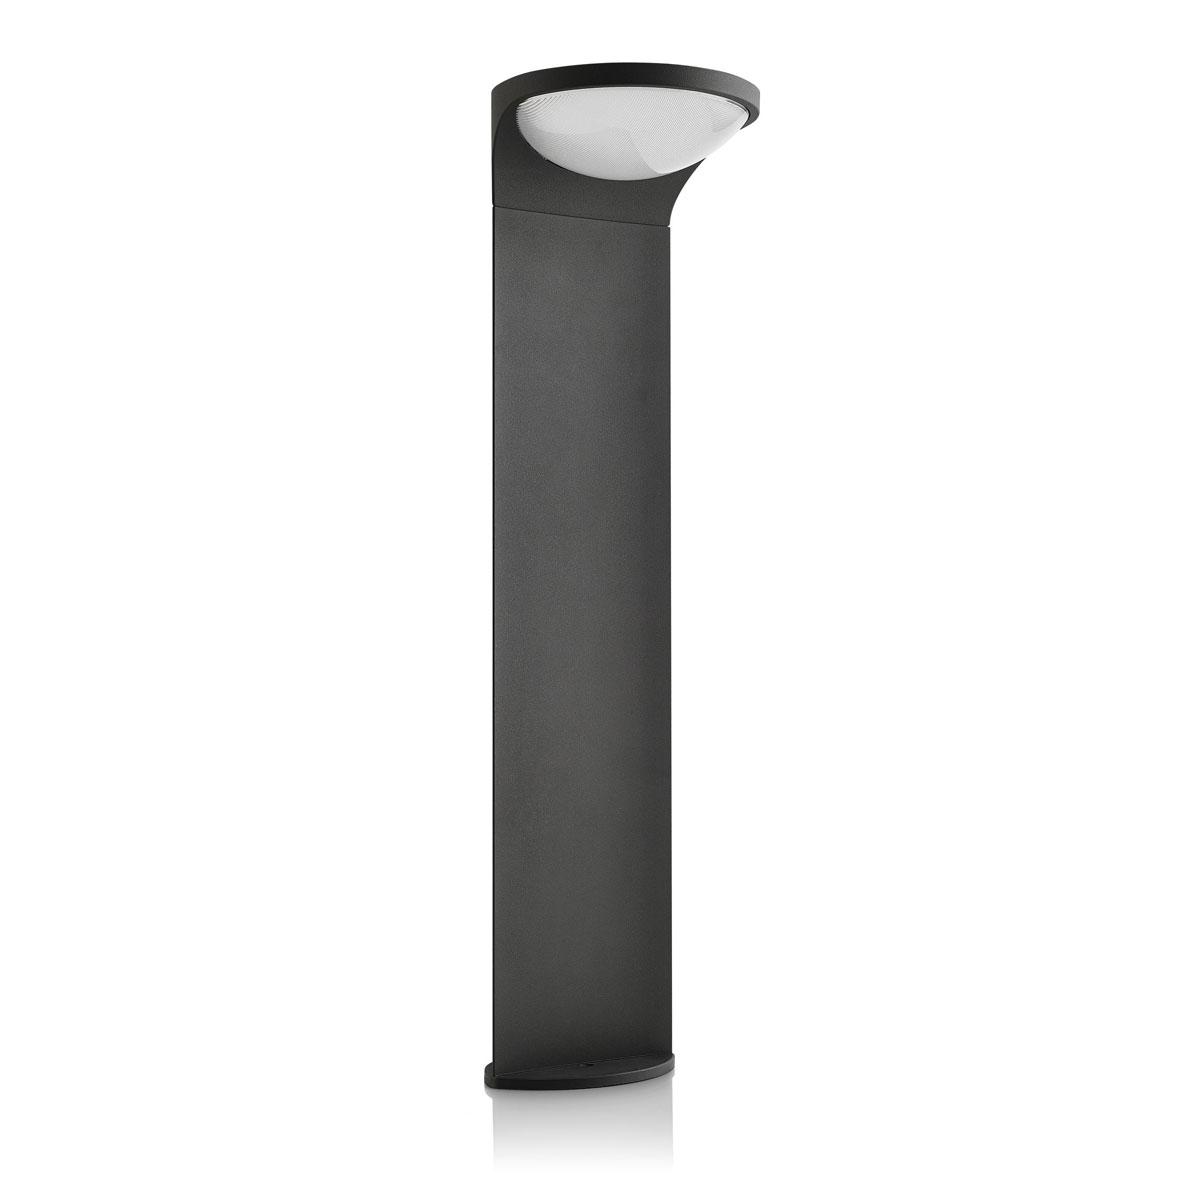 philips mygarden dusk sokkel antraciet zonne energie. Black Bedroom Furniture Sets. Home Design Ideas